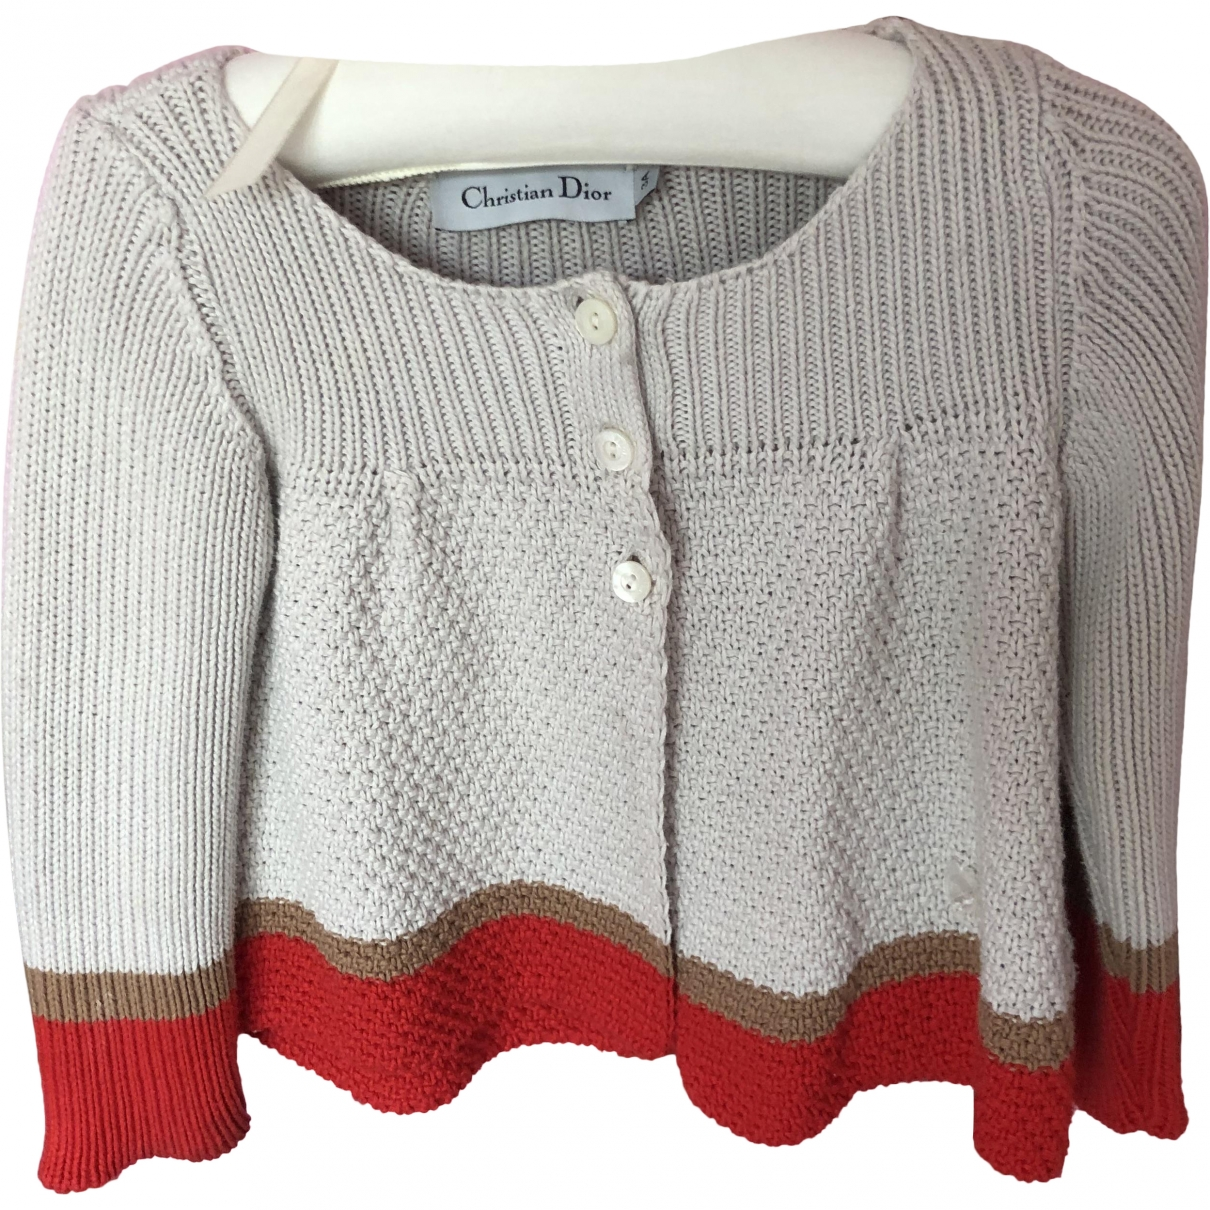 Dior \N Ecru Wool jacket & coat for Kids 3 years - up to 98cm FR